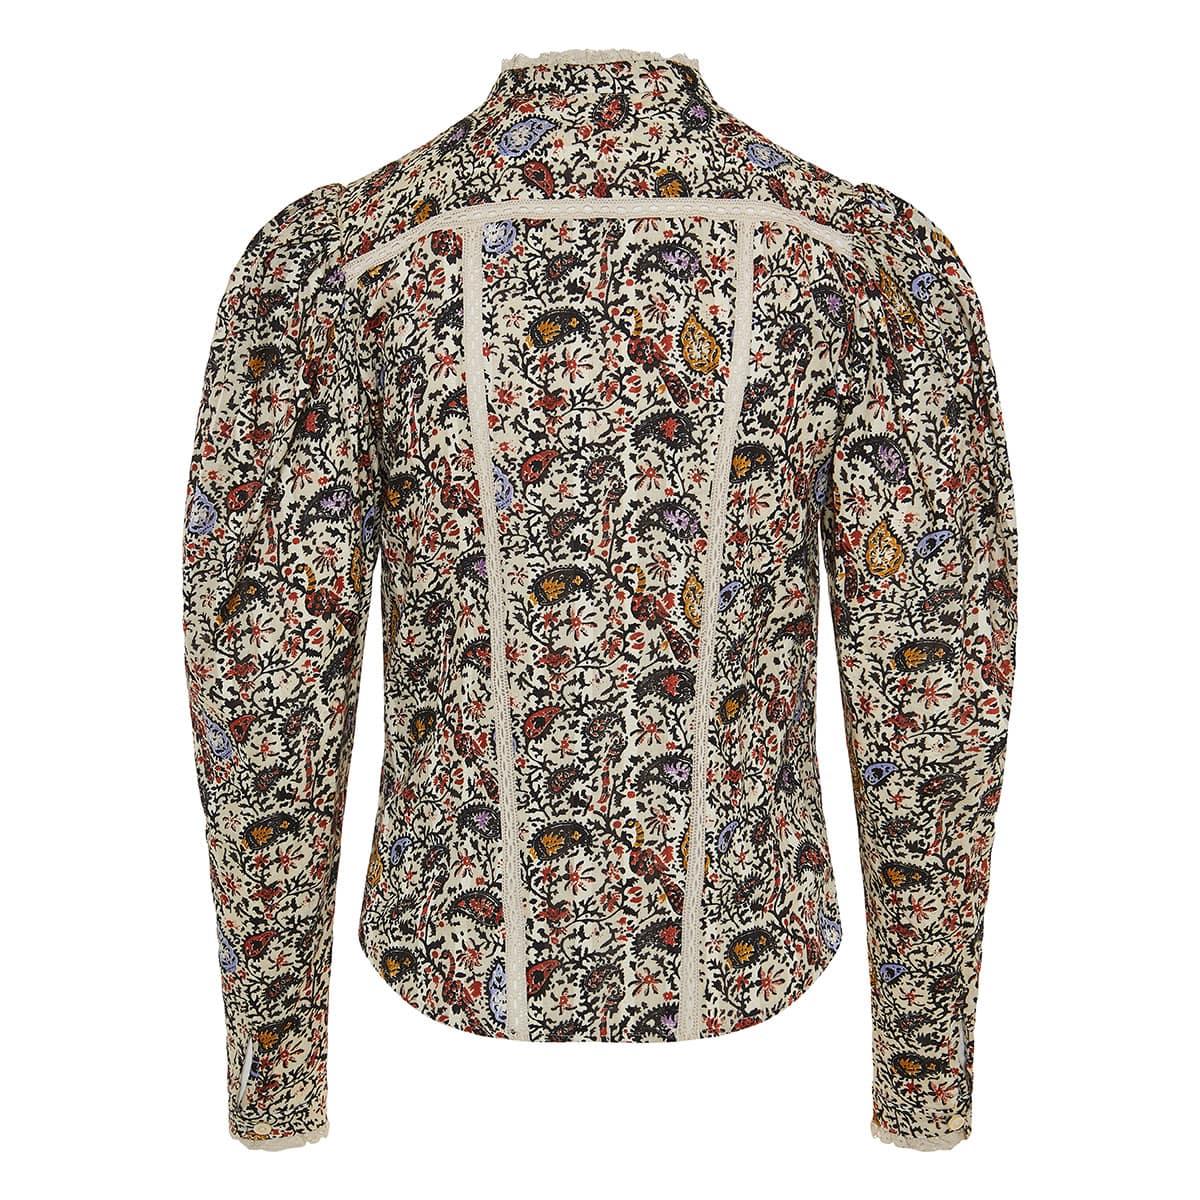 Reafi puff-sleeve paisley shirt